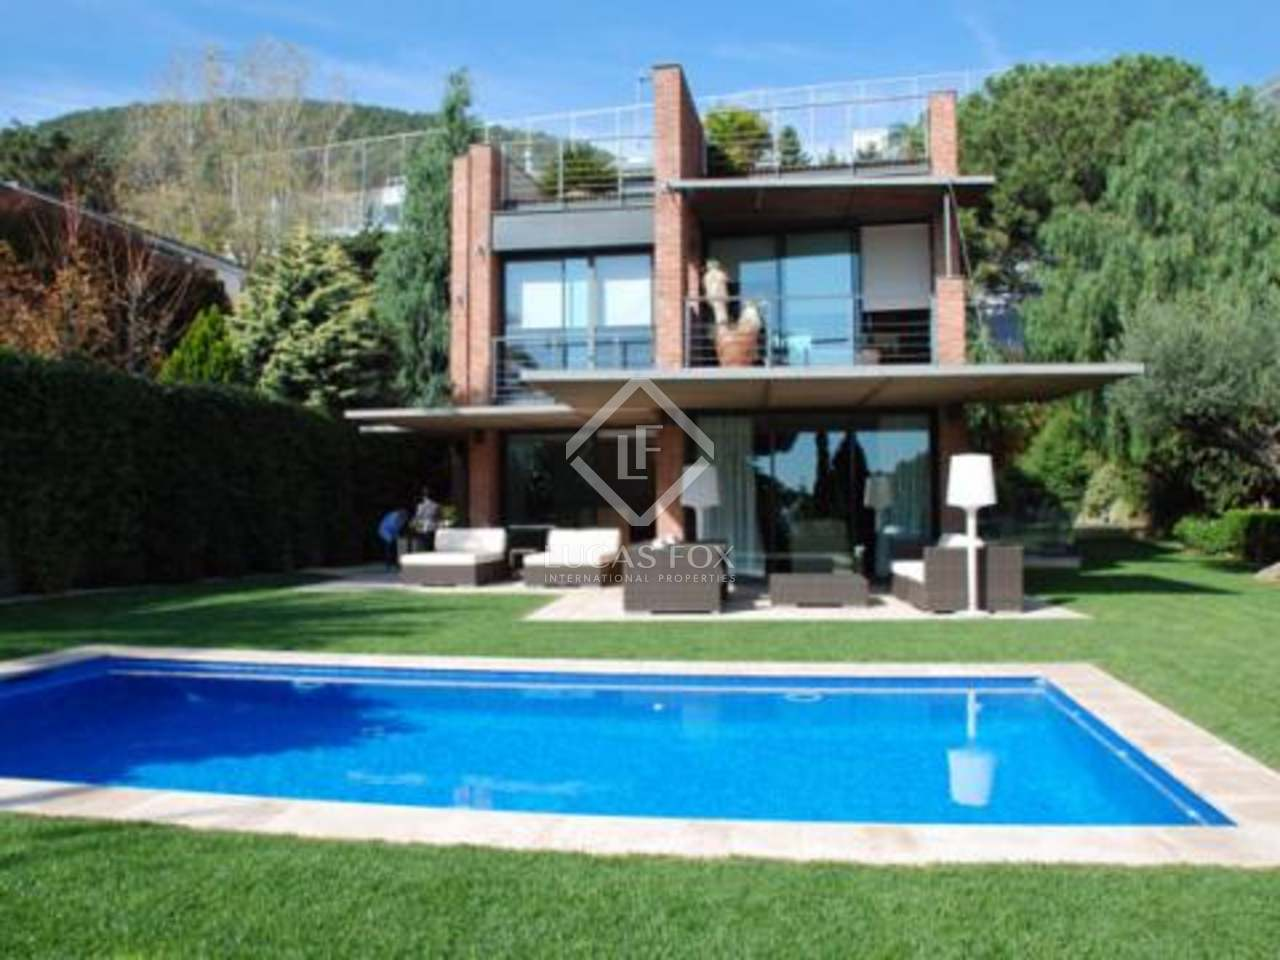 Casa de lujo en venta en pedralbes zona alta de barcelona for Casas con piscina baratas barcelona